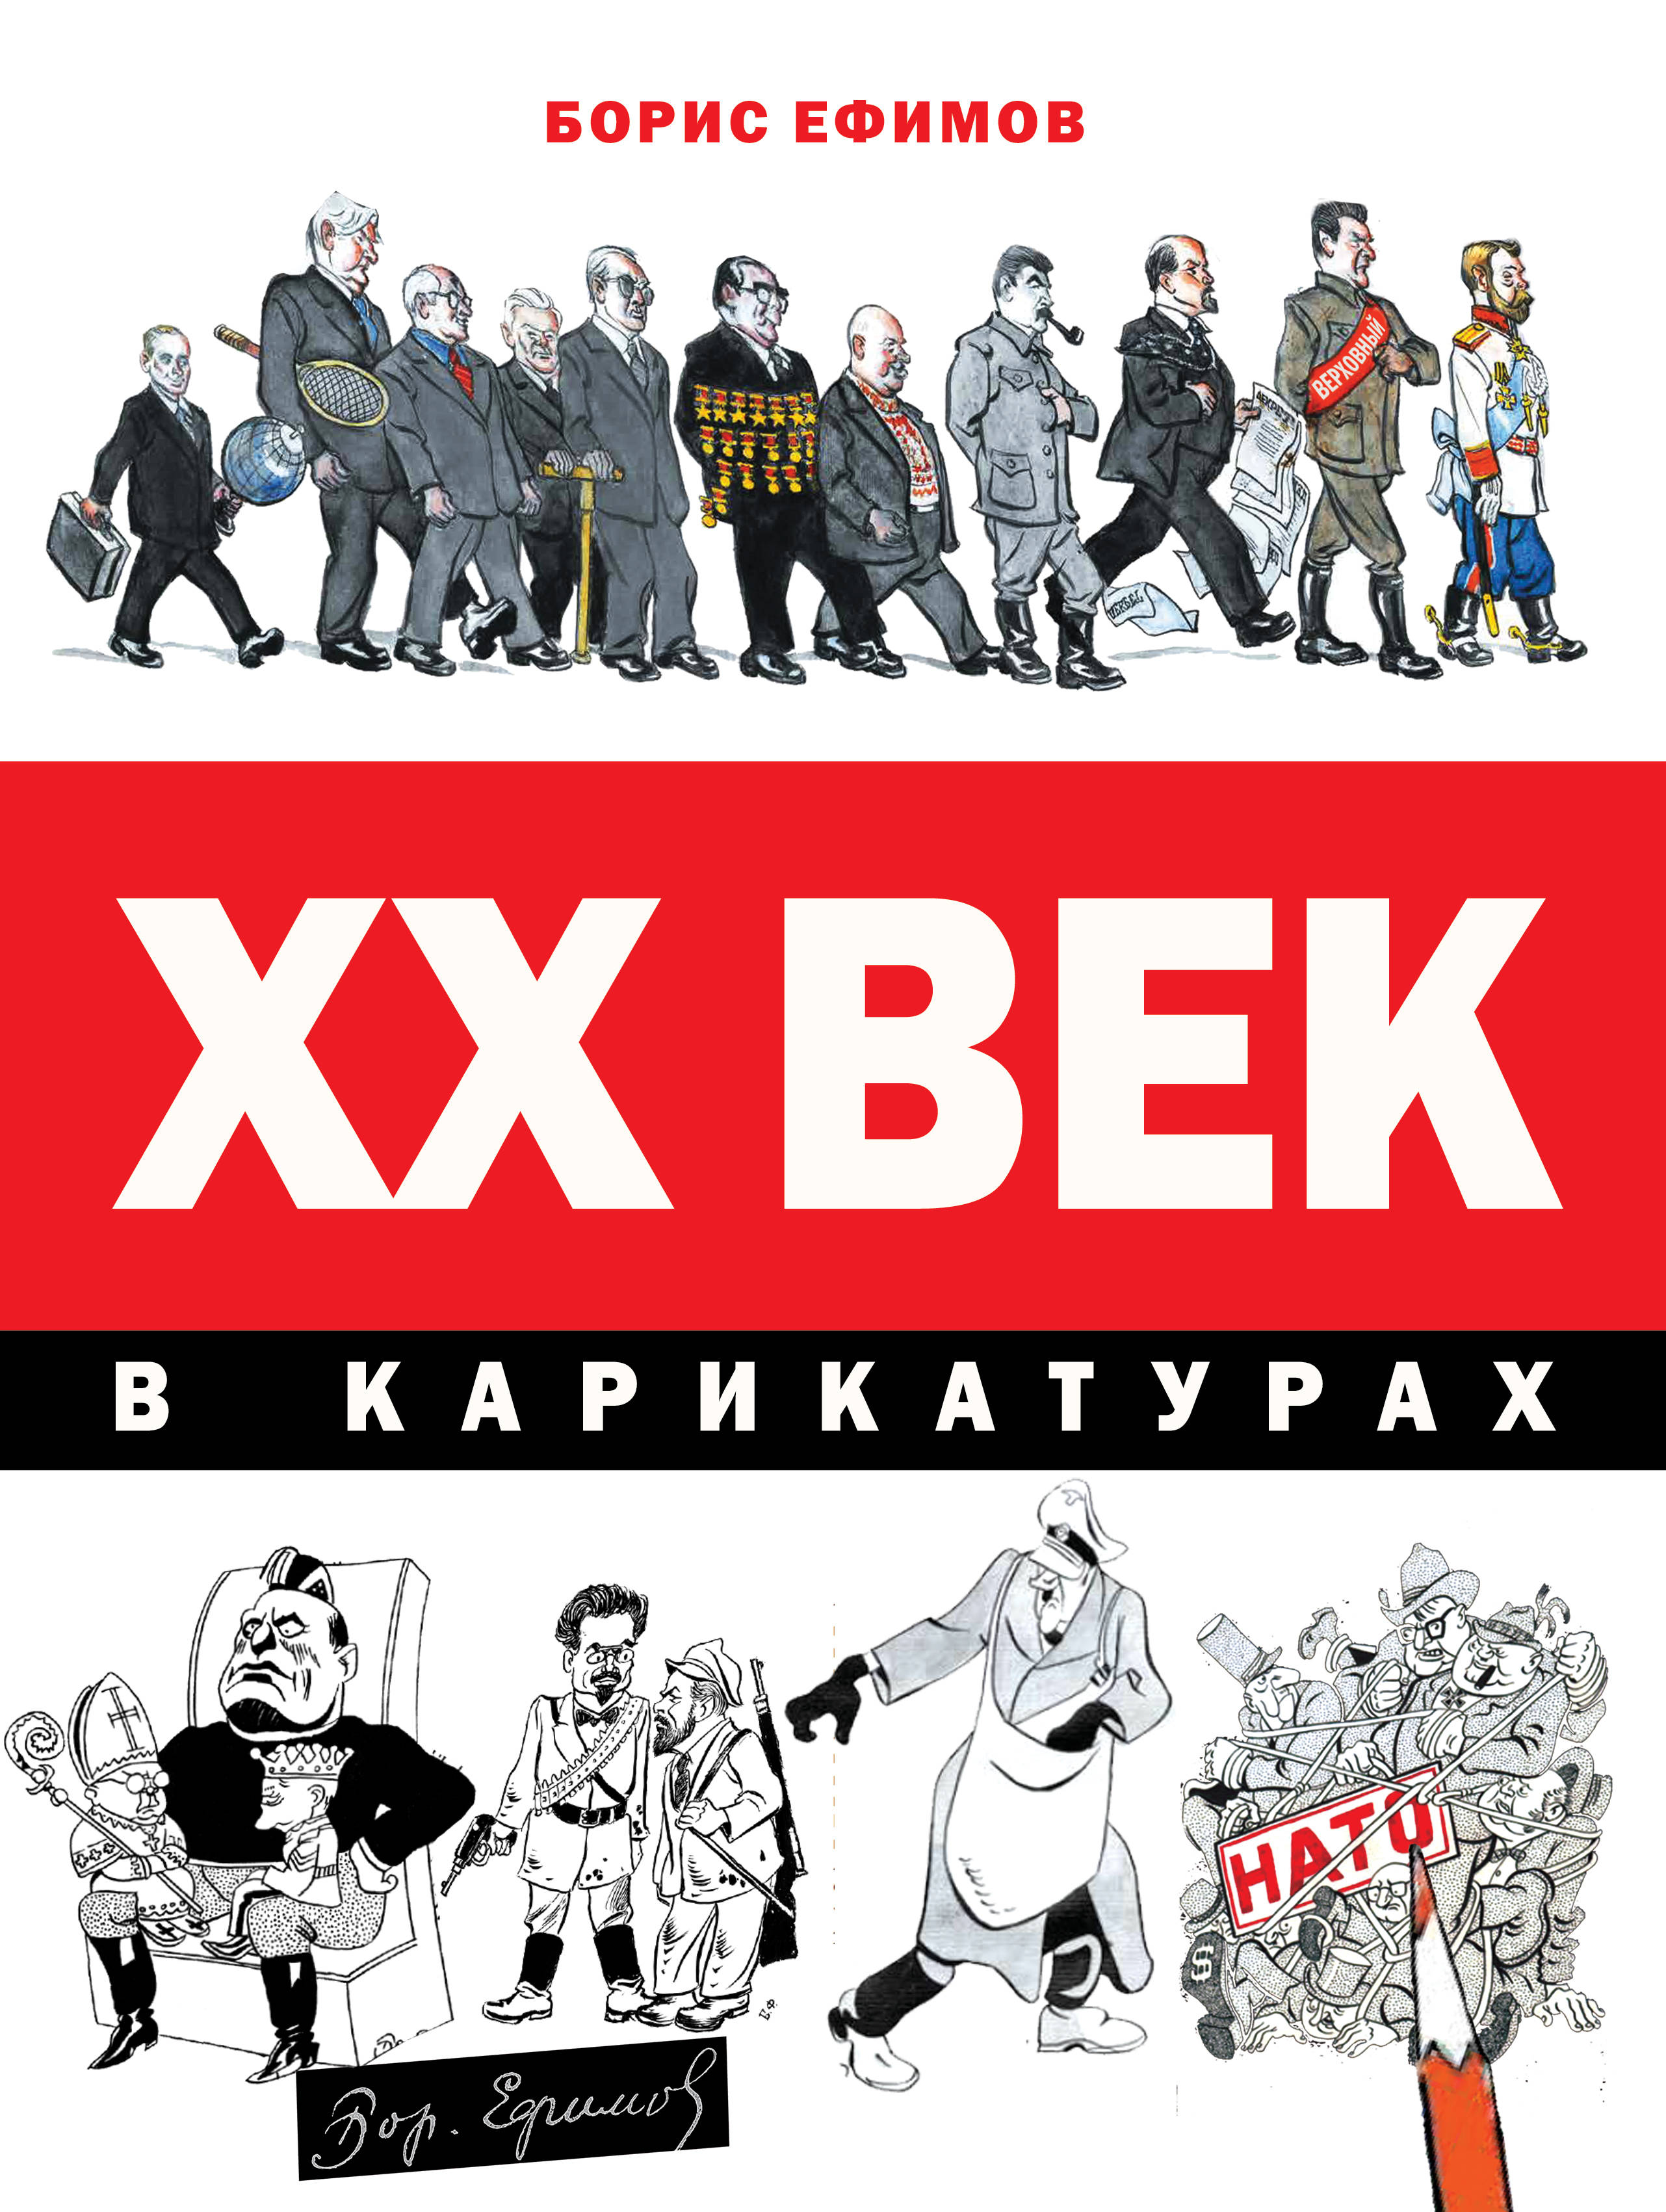 Борис Ефимов ХХ век в карикатурах xx век ретропанорама встреча друзей